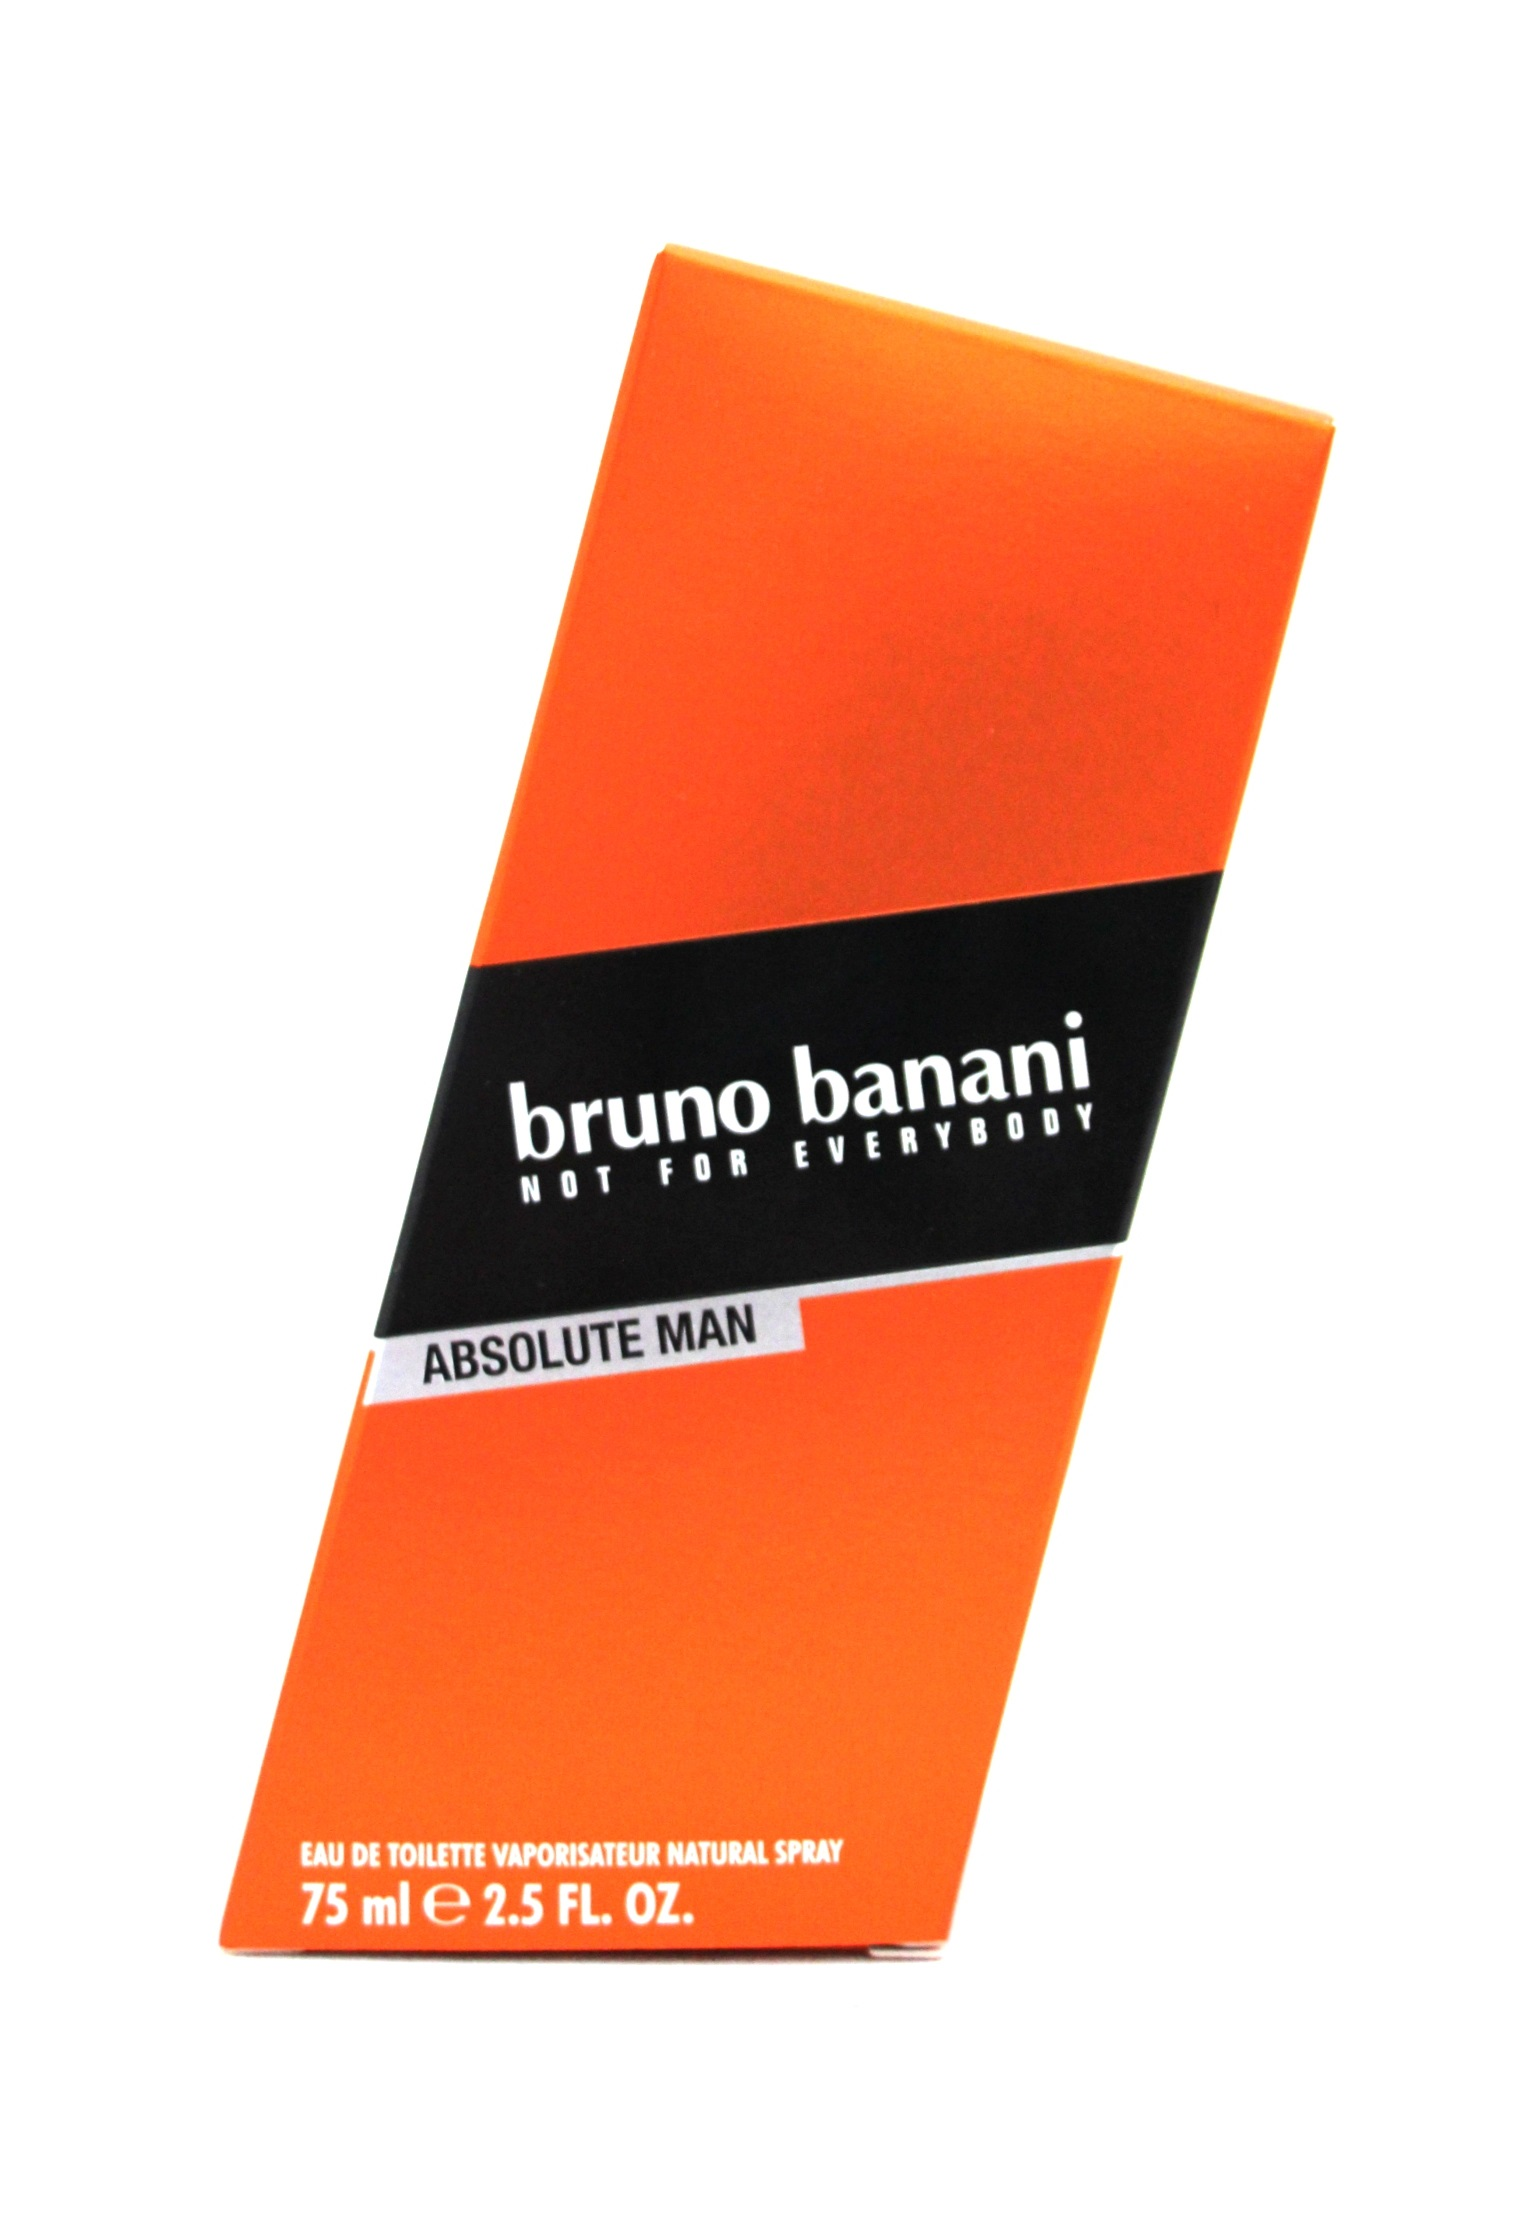 Bruno Banani Absolute Man Eau de Toilette